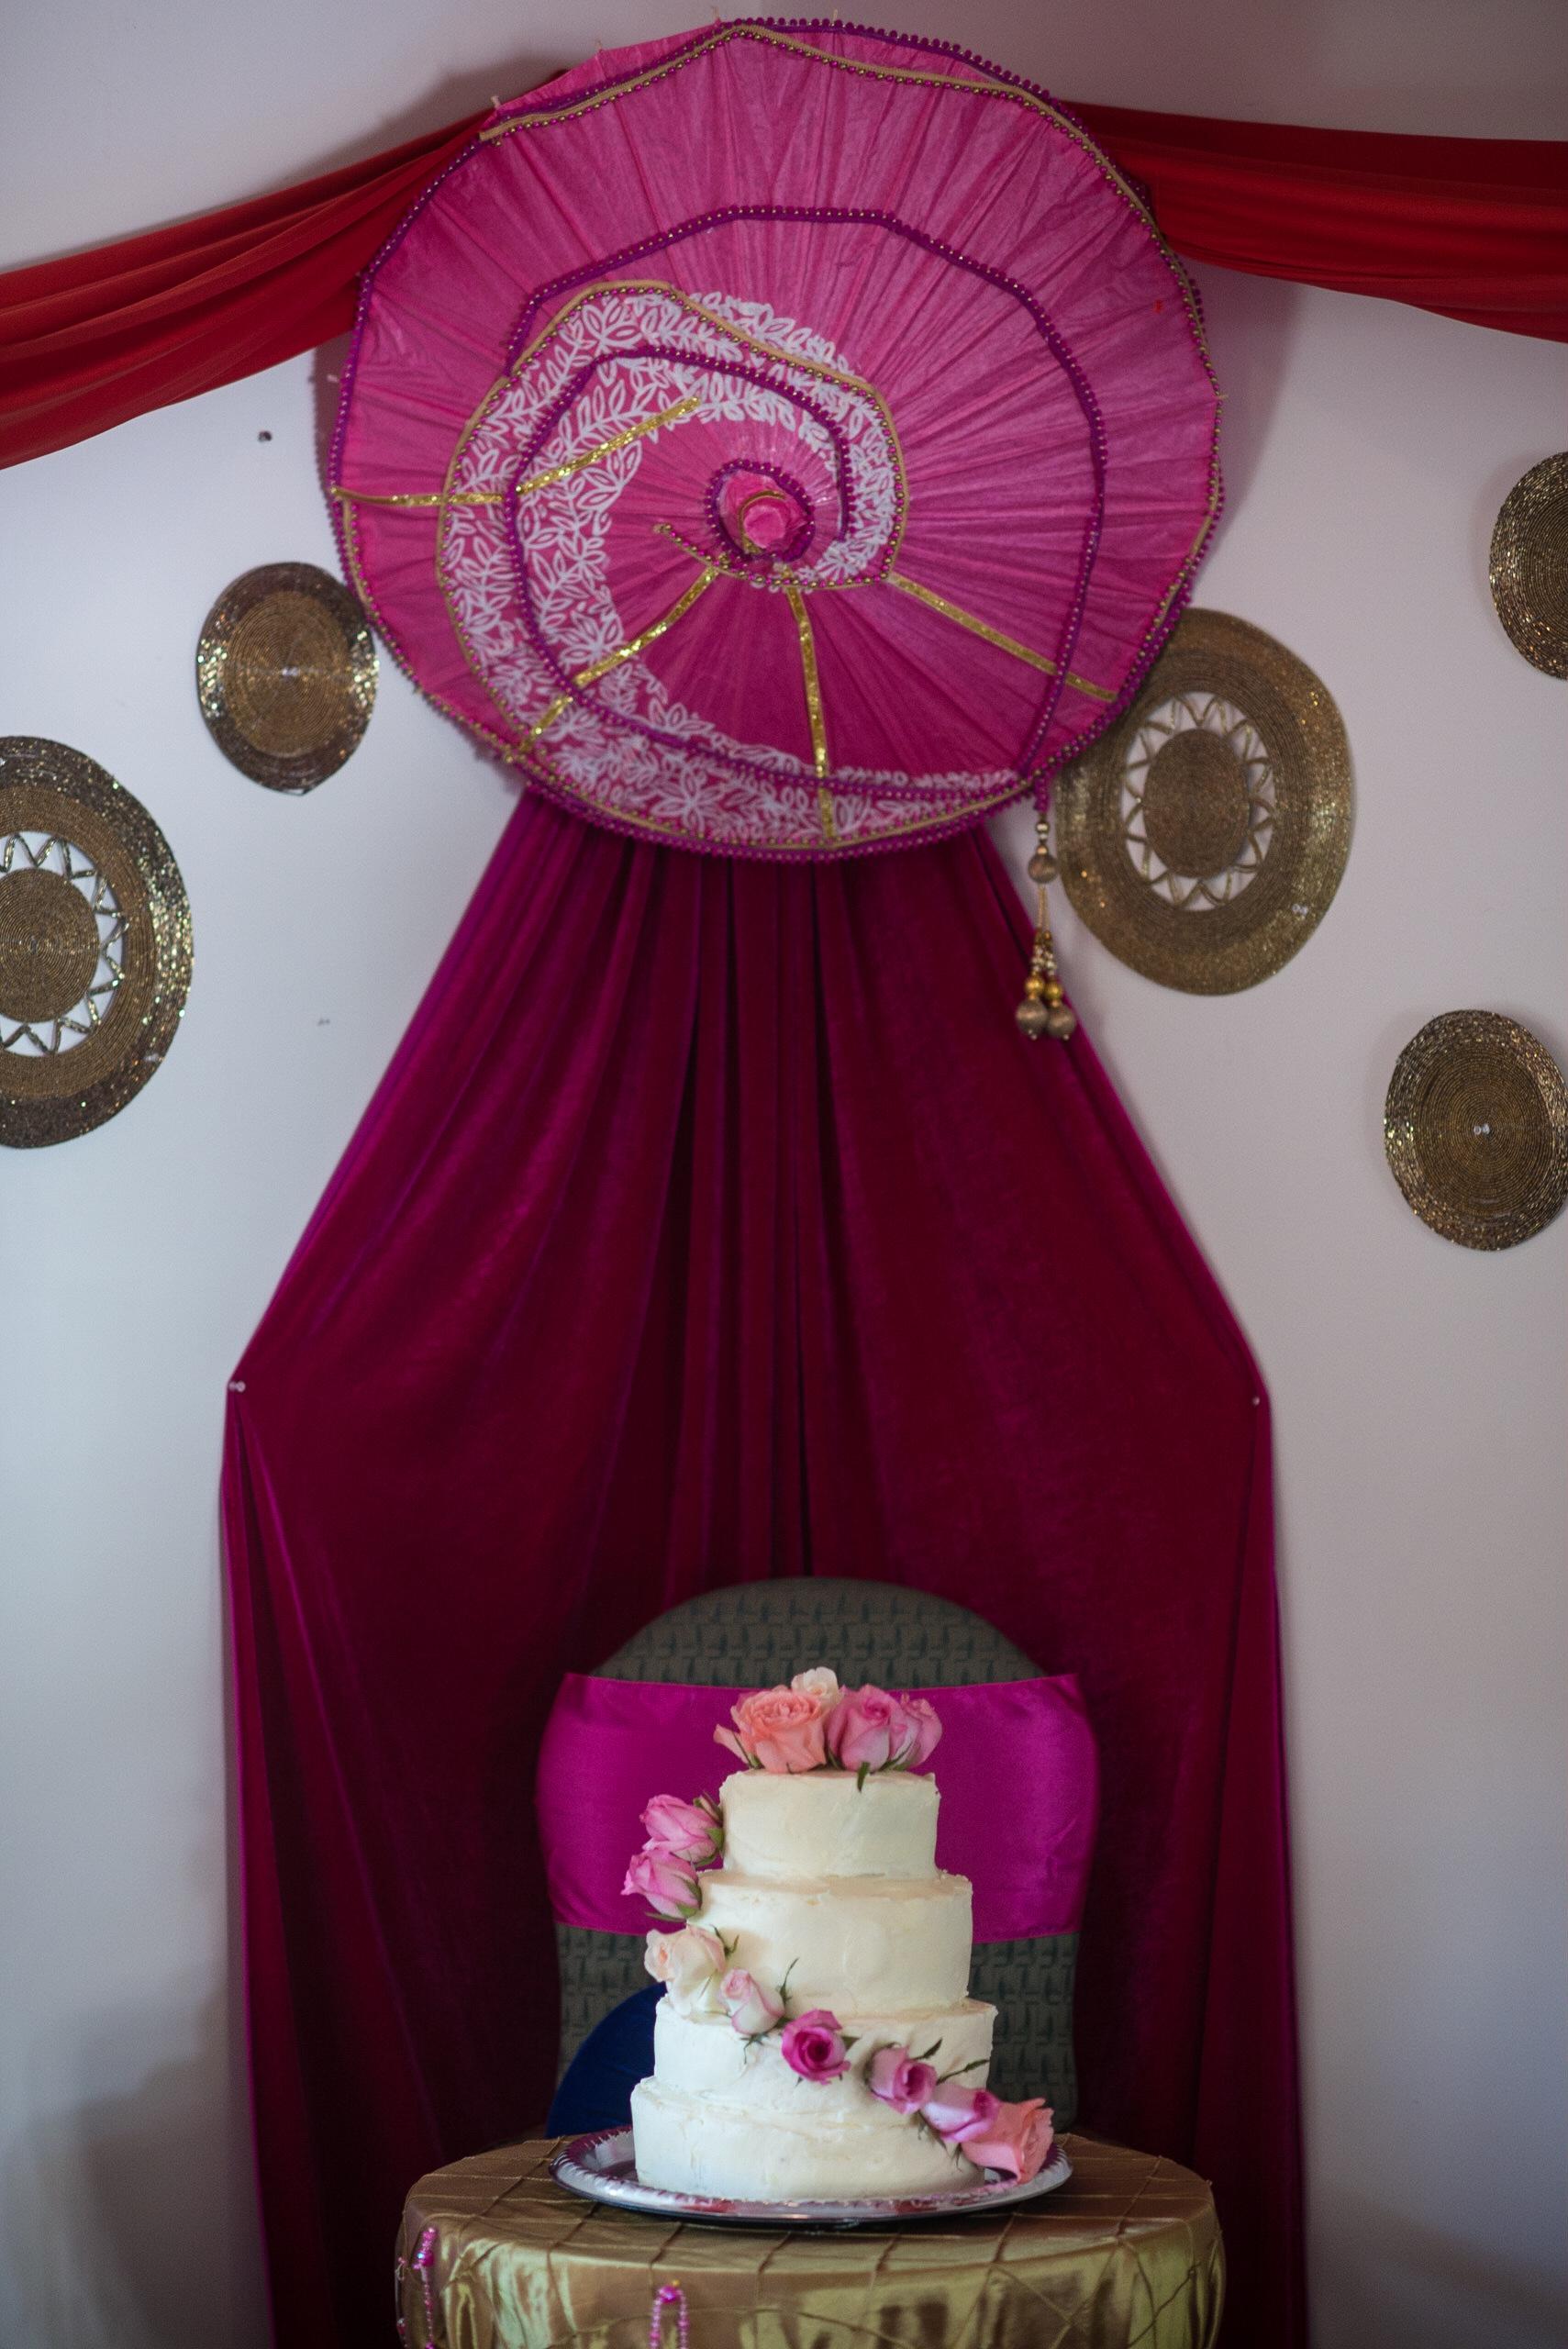 20150509-Meg-and-Thomas-Wedding-0987-DSC_0793.jpg